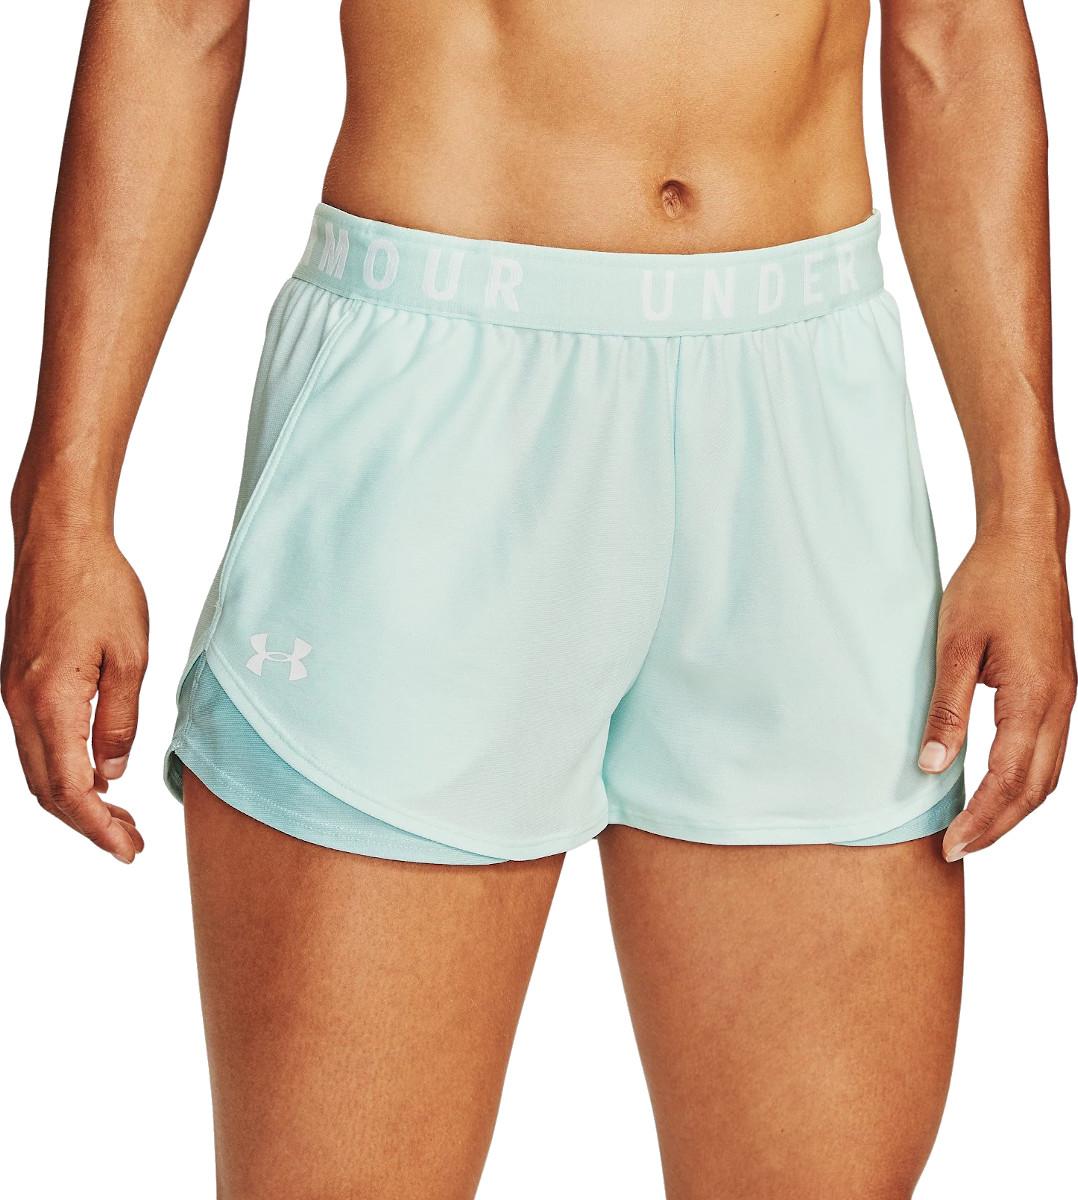 enlace tallarines Beber agua  Pantalón corto Under Armour Play Up Shorts 3.0 - Top4Running.es